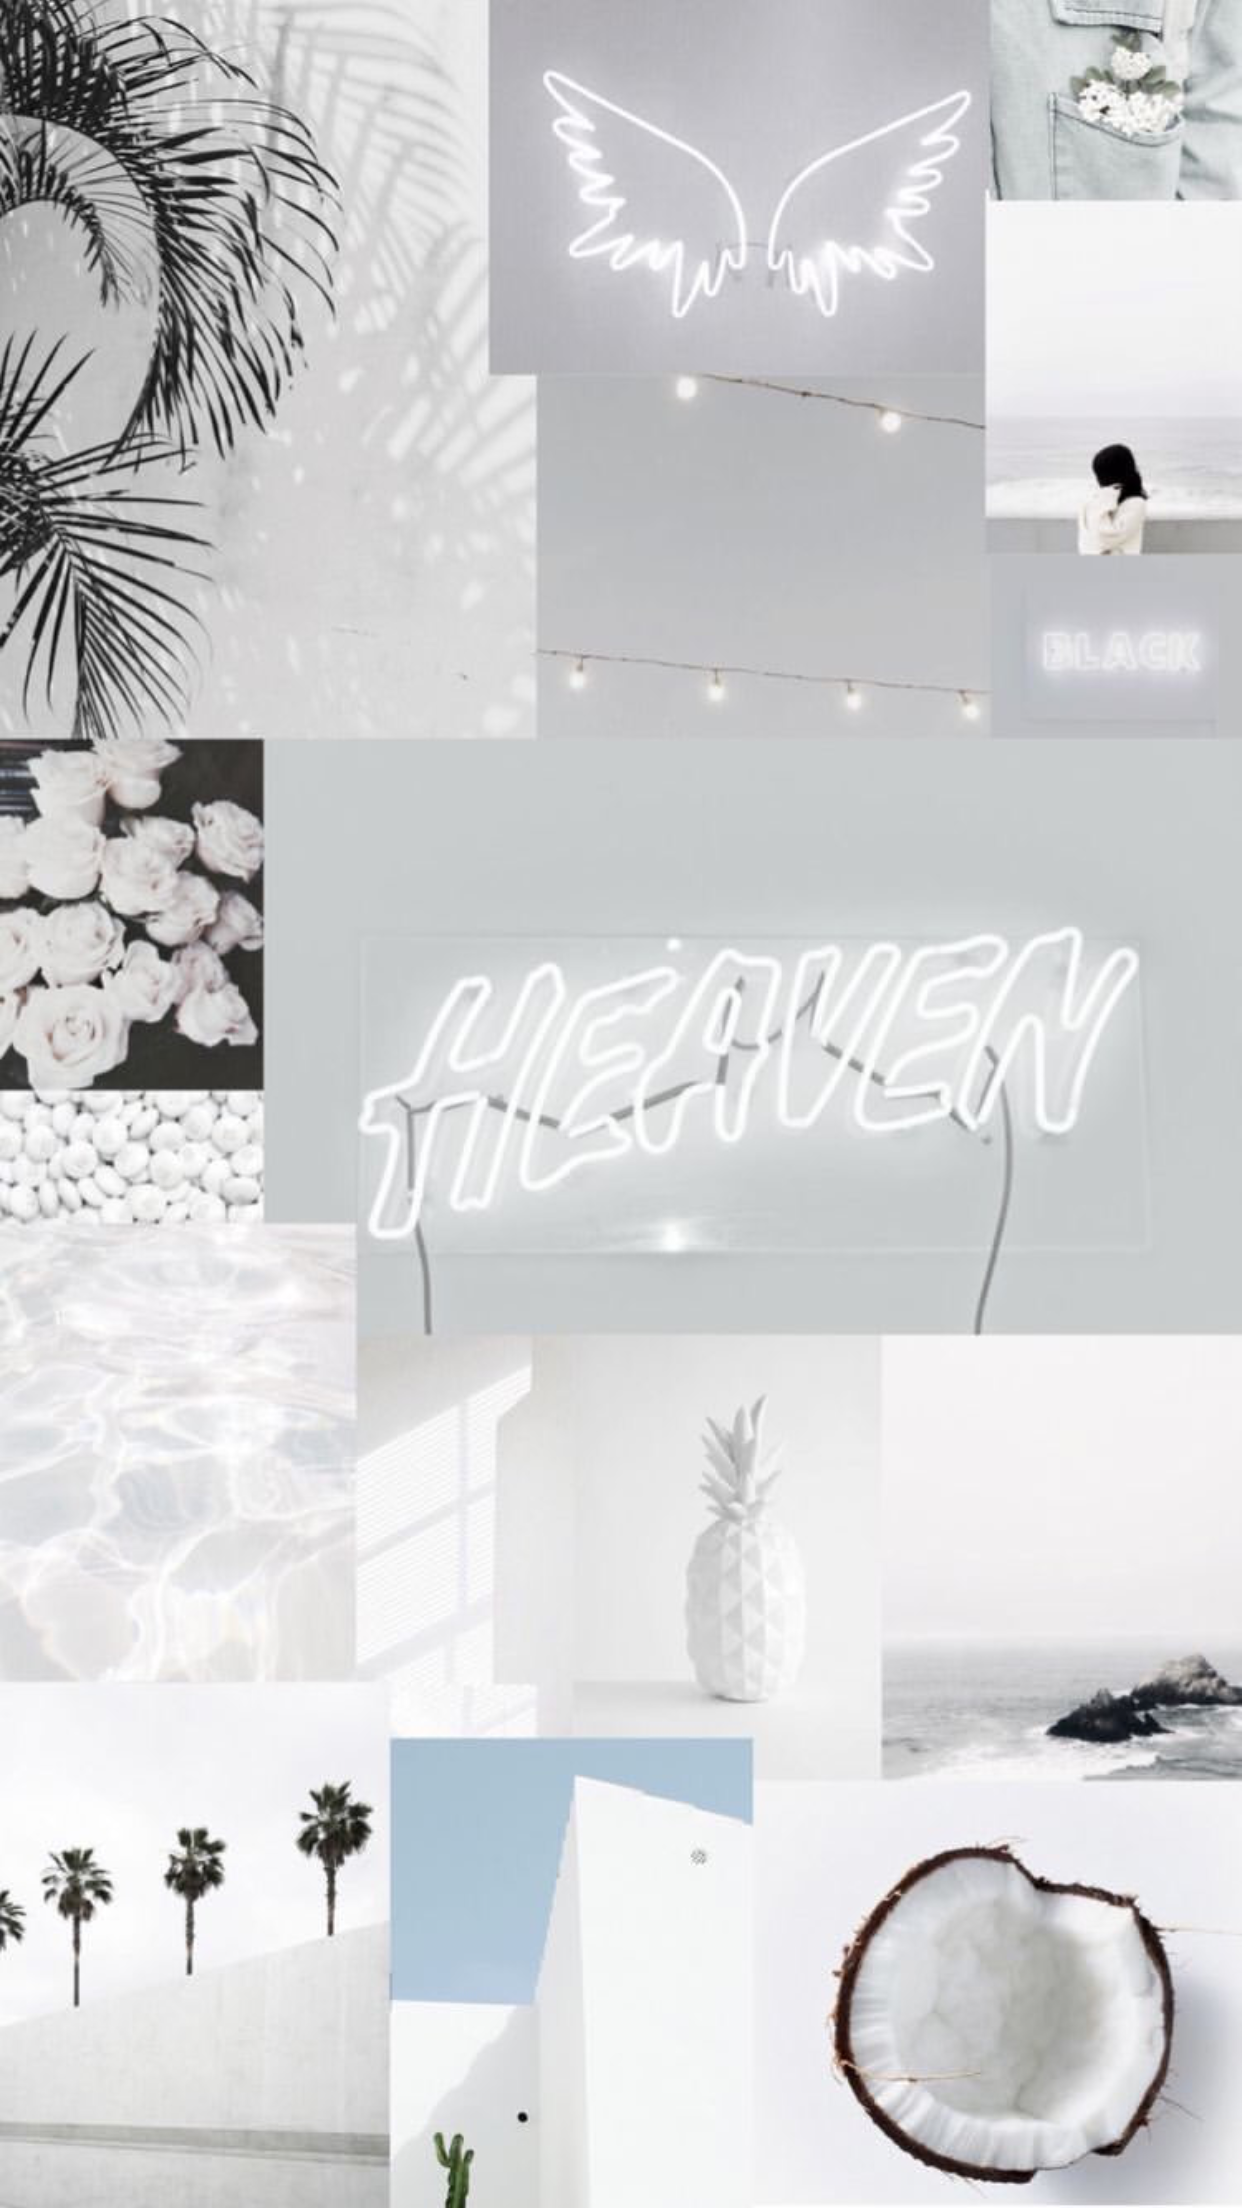 Pin By Aidah Cantik On A Iphone Wallpaper Tumblr Aesthetic White Wallpaper For Iphone Aesthetic Iphone Wallpaper